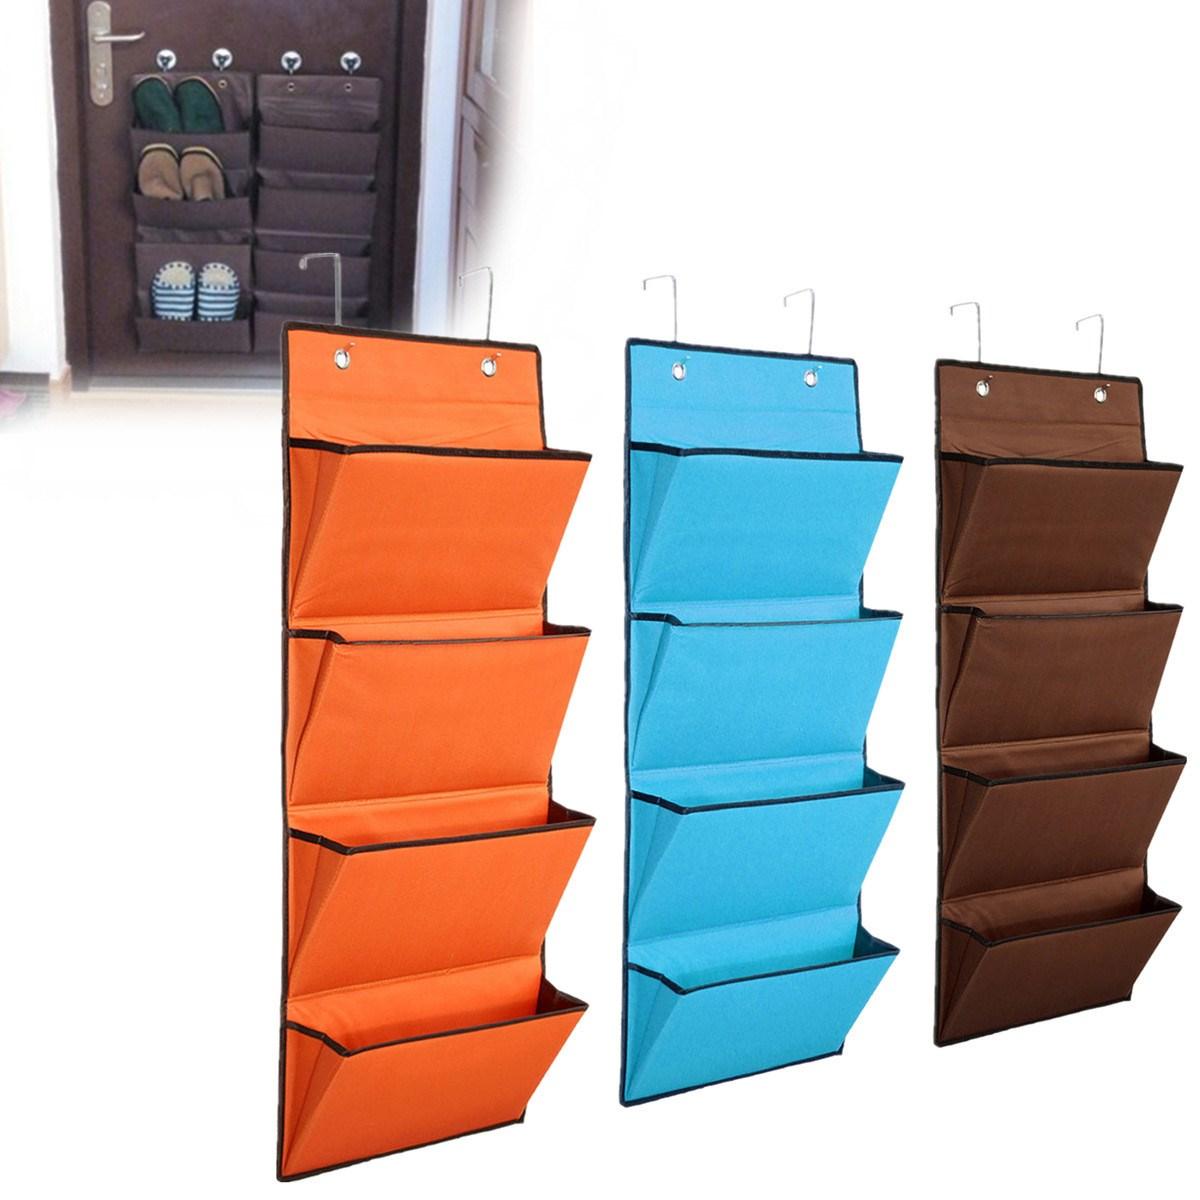 Hanging Storage Bag Book Newspaper Jewelry Organizer Over Door Cloth Shoes Storage Ganchos Para Parede Closet Toy 4 Tier